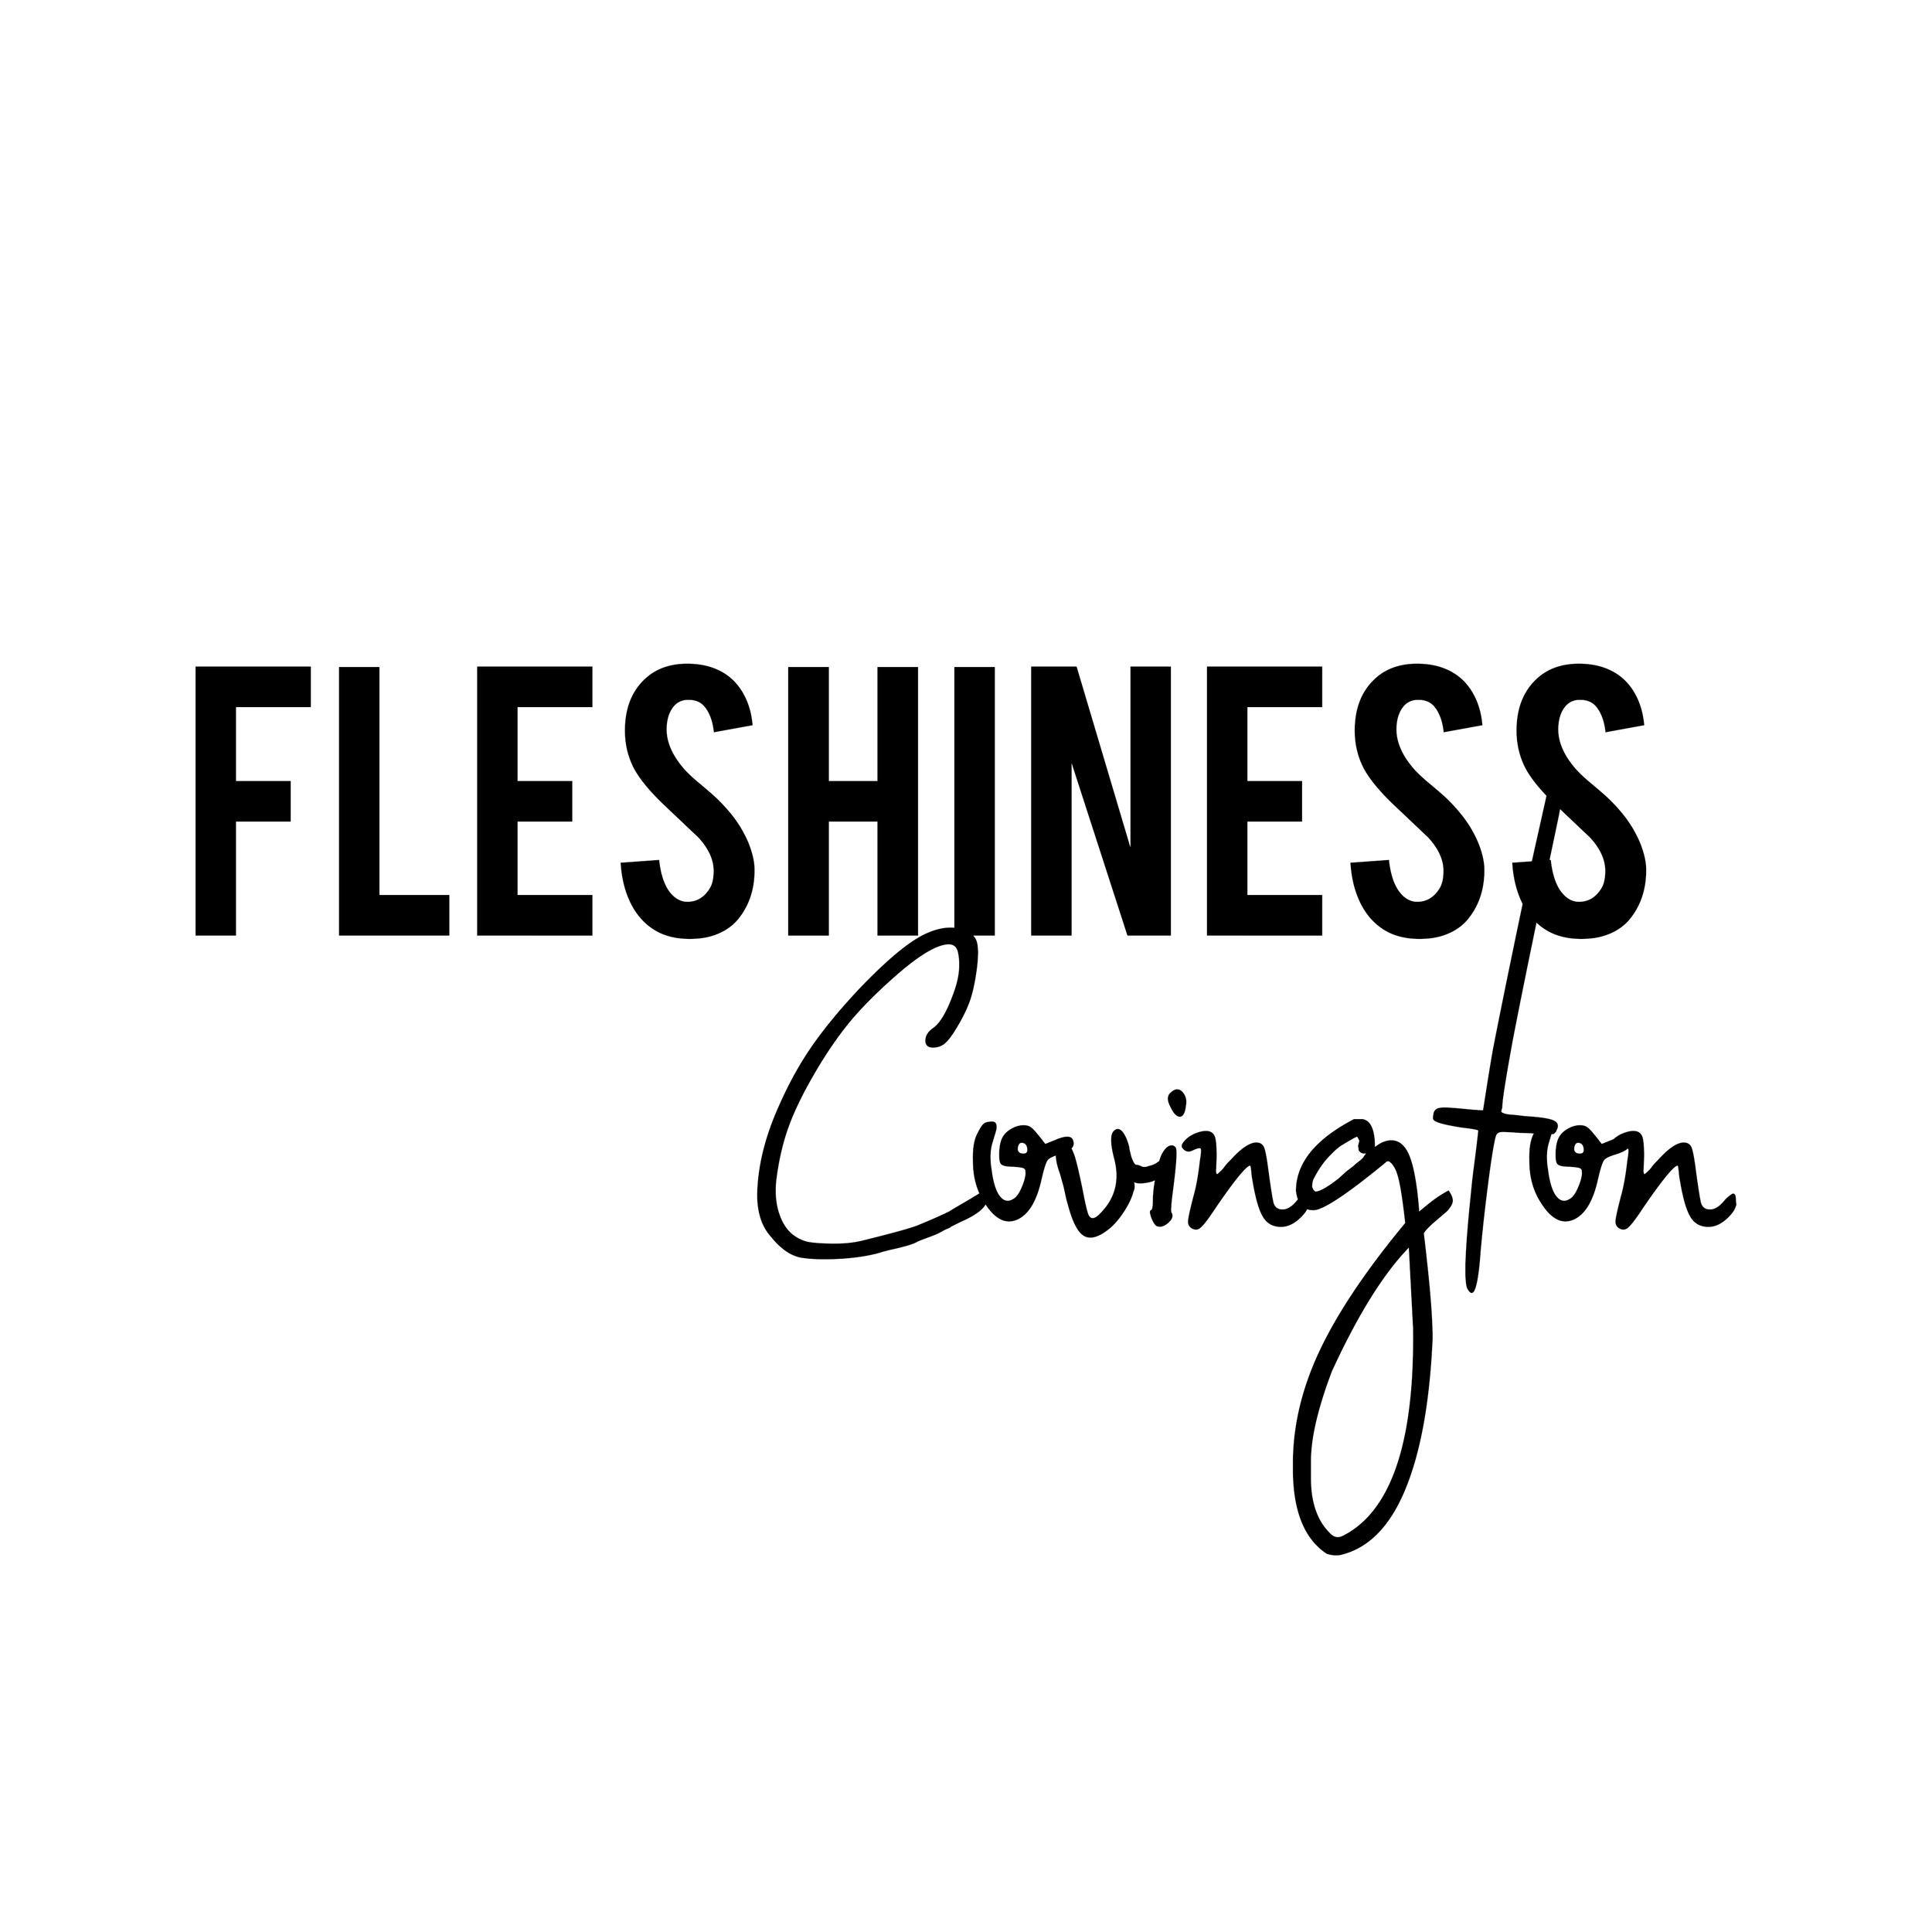 Fleshiness - Covington.jpg